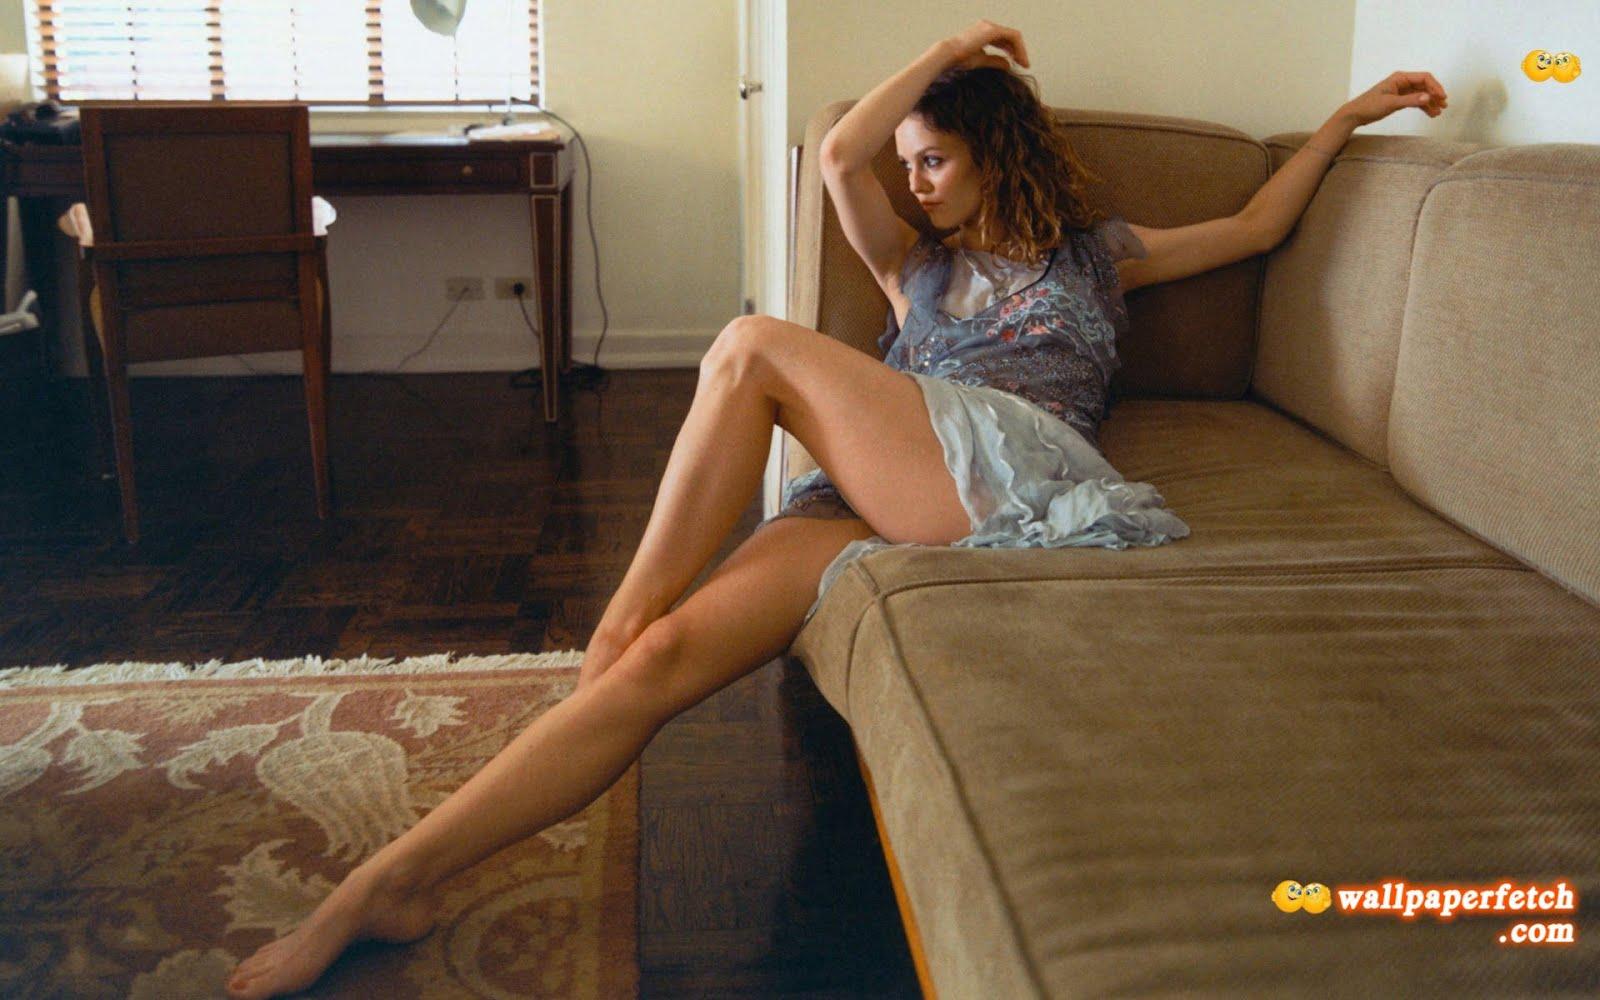 Sexy Teen Spread Legs